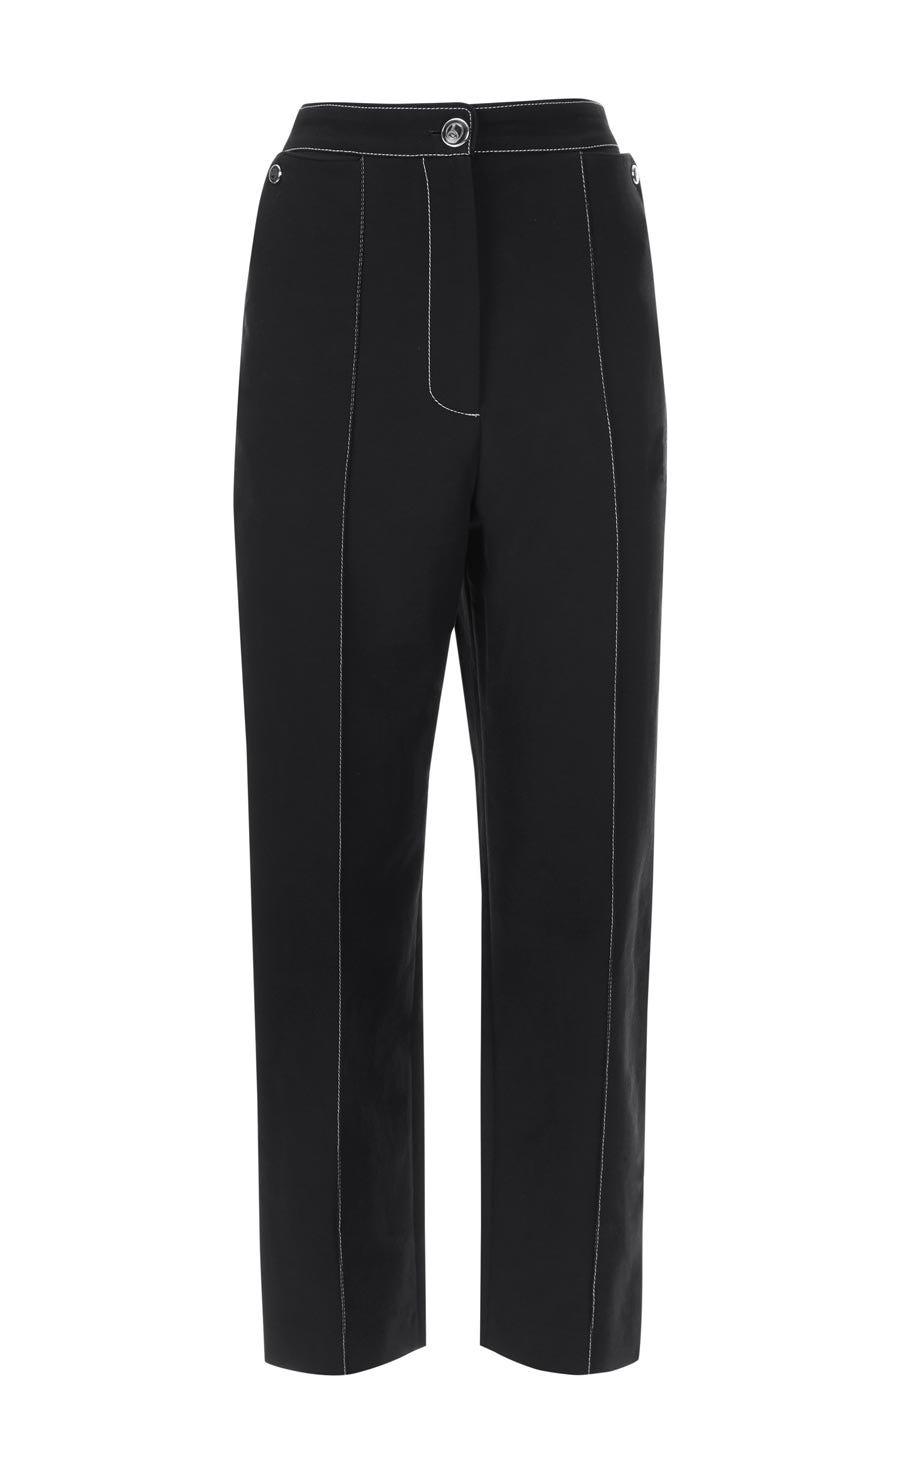 Margot Tailoring Trousers